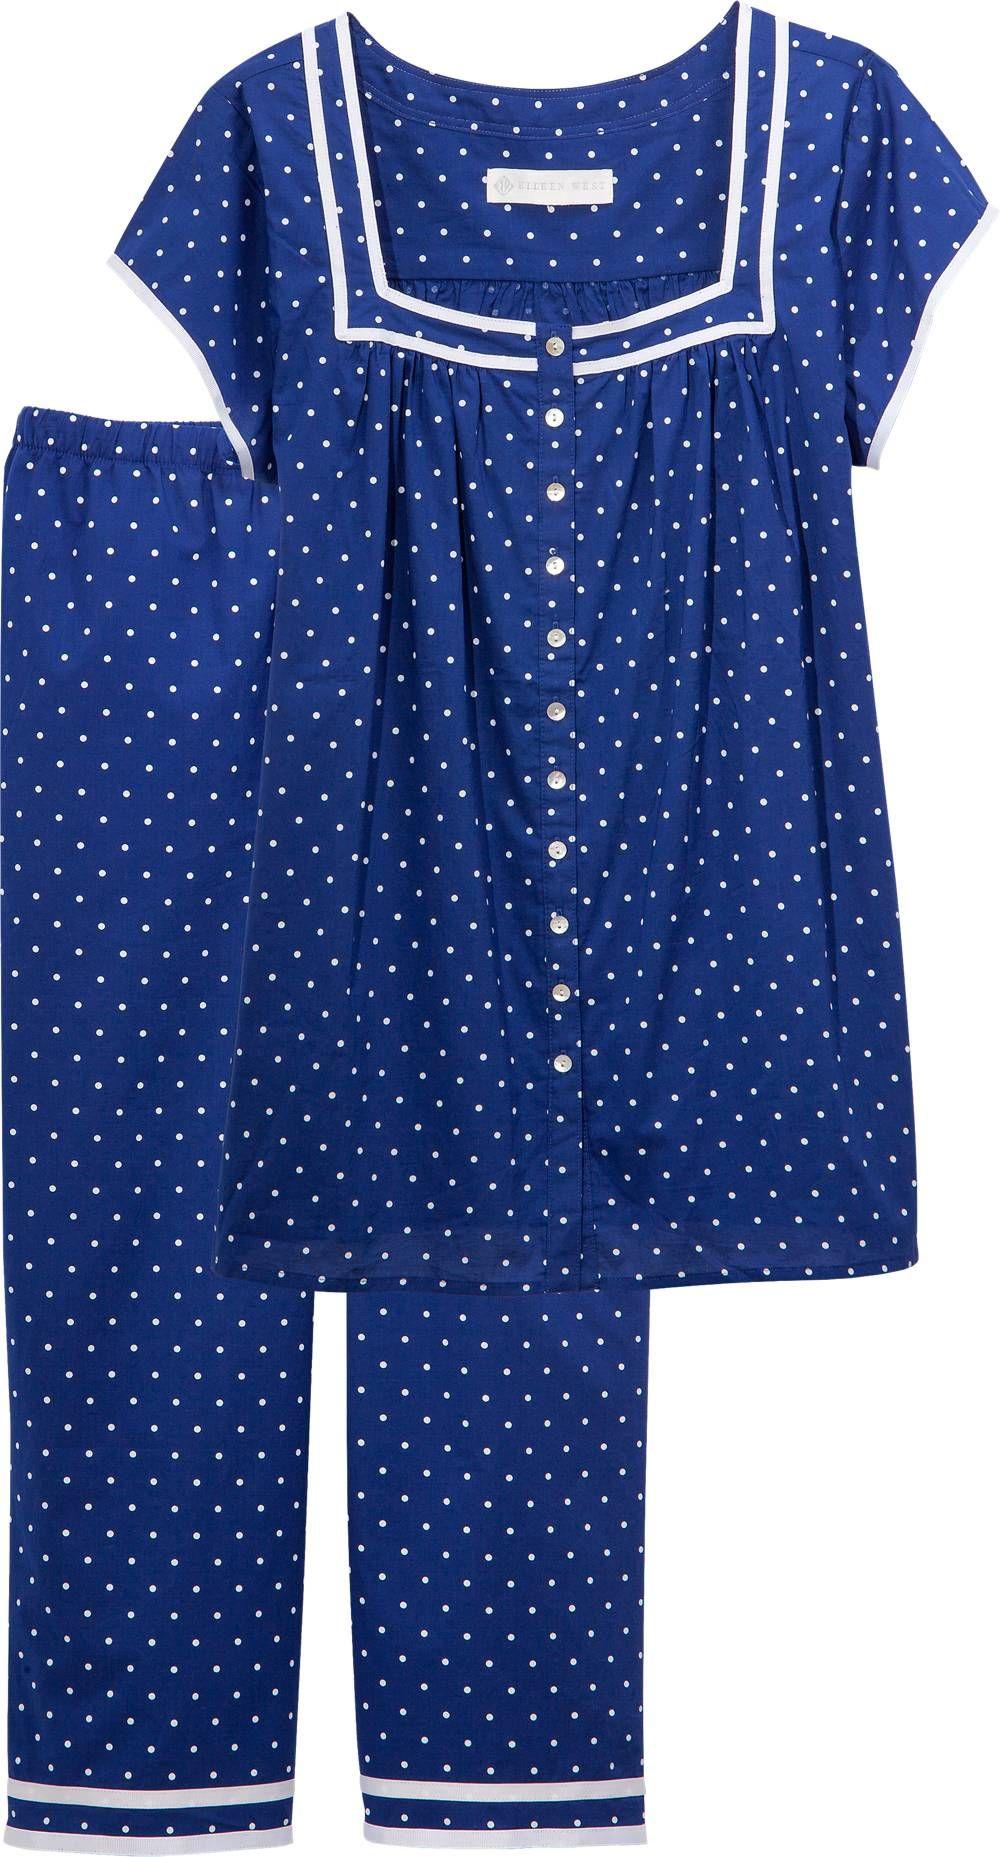 Eileen West Summer Blues Pjs Cotton Lawn Pajamas For Women Pajamas Women Cotton Night Dress Cotton Pajamas Women [ 1857 x 1000 Pixel ]